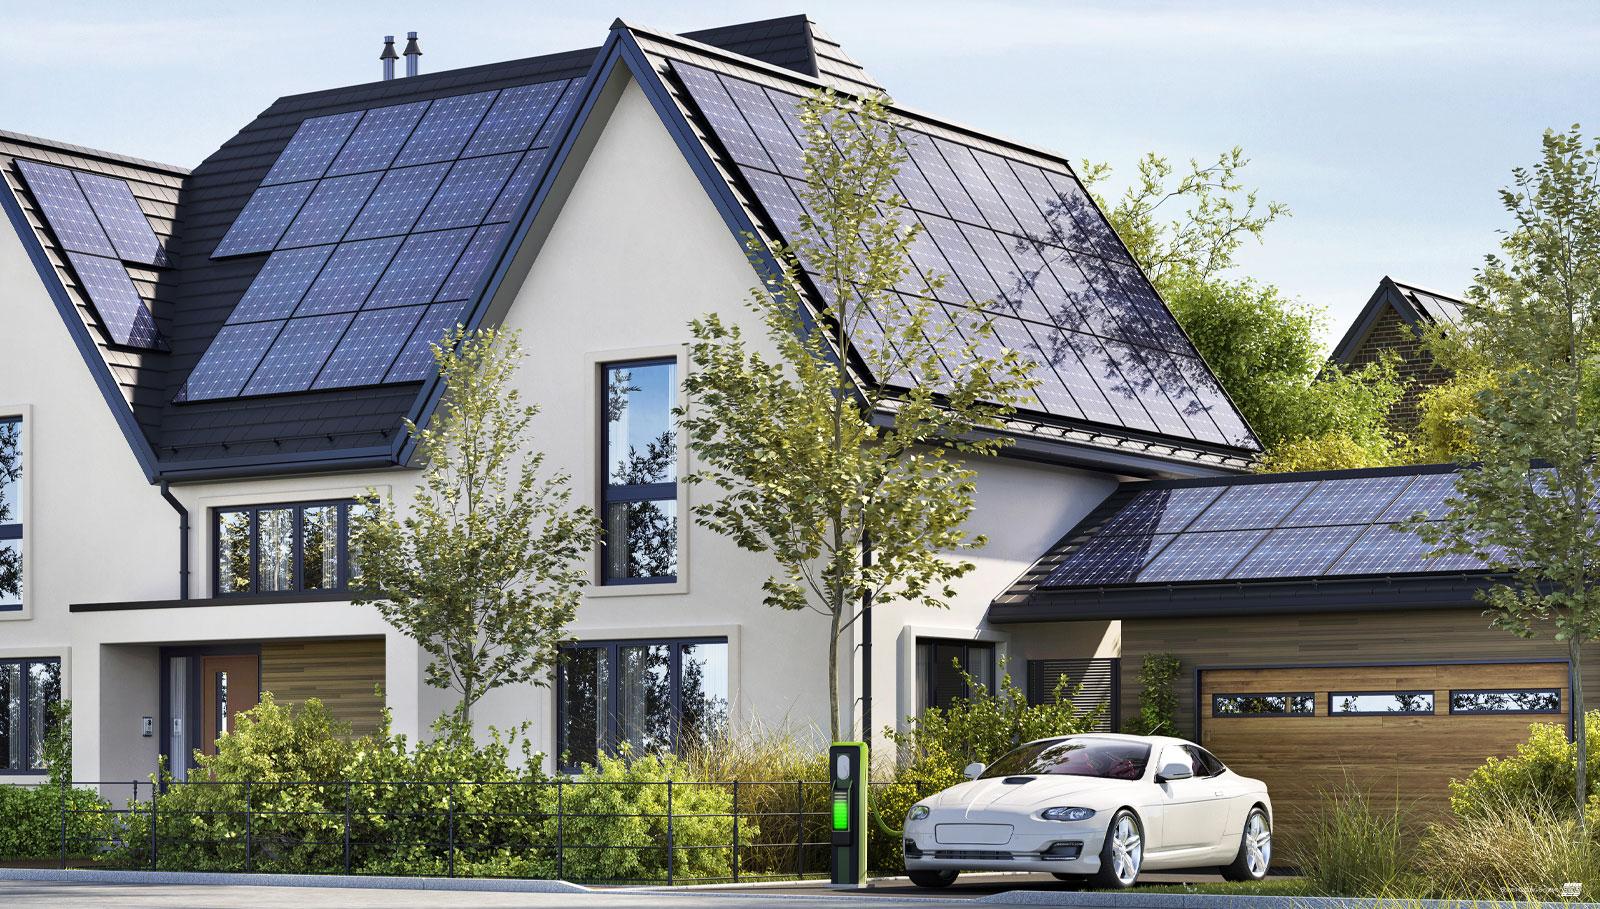 Photovoltaik Solaranlage Wallbox - Server Cooling Systems GmbH